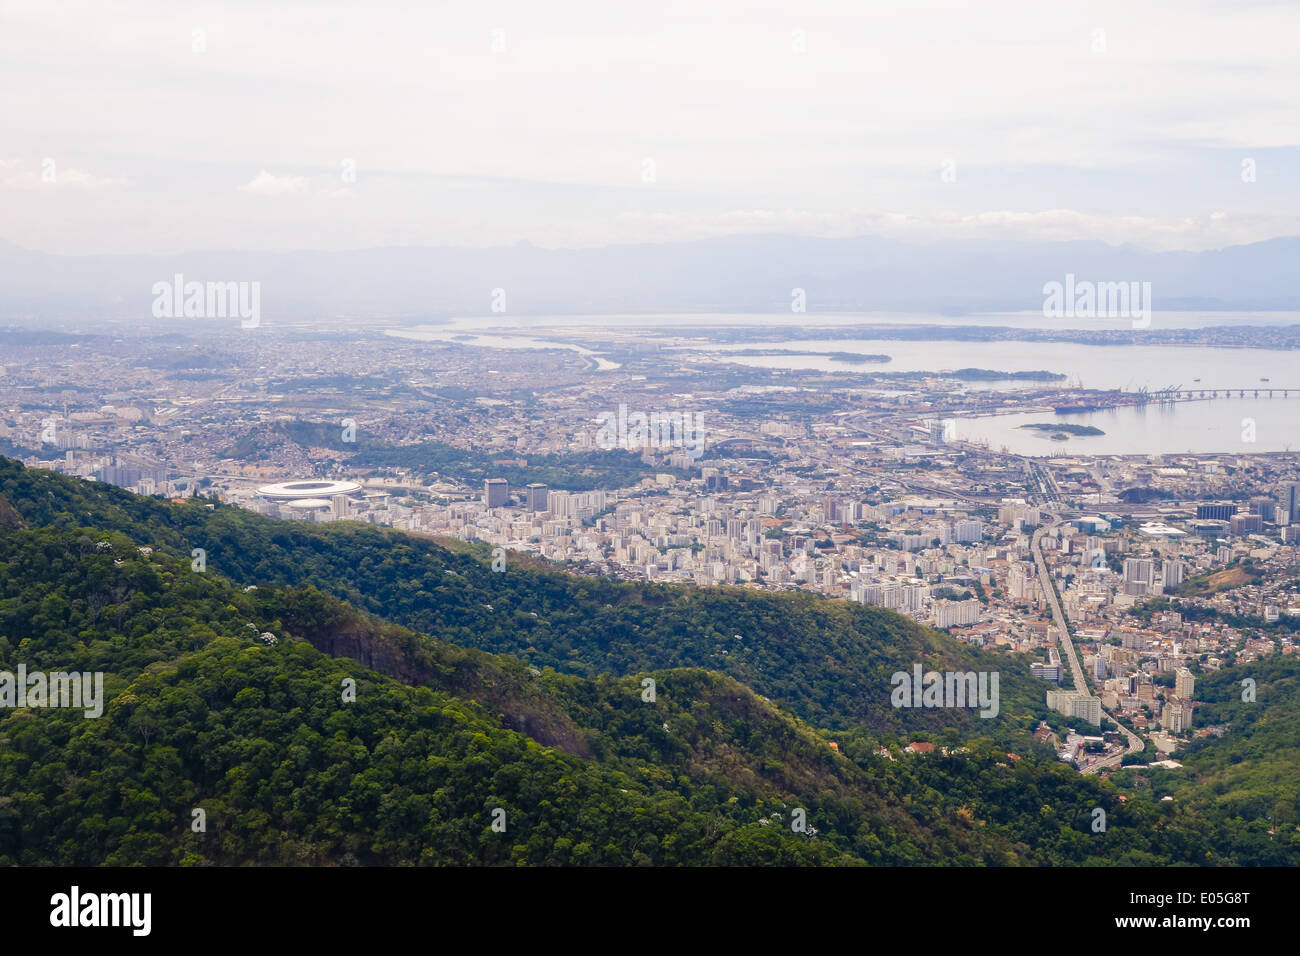 Río de Janeiro, Zona Norte, Maracana stadion, FIFA 2014 Worldcup, Brasil Imagen De Stock